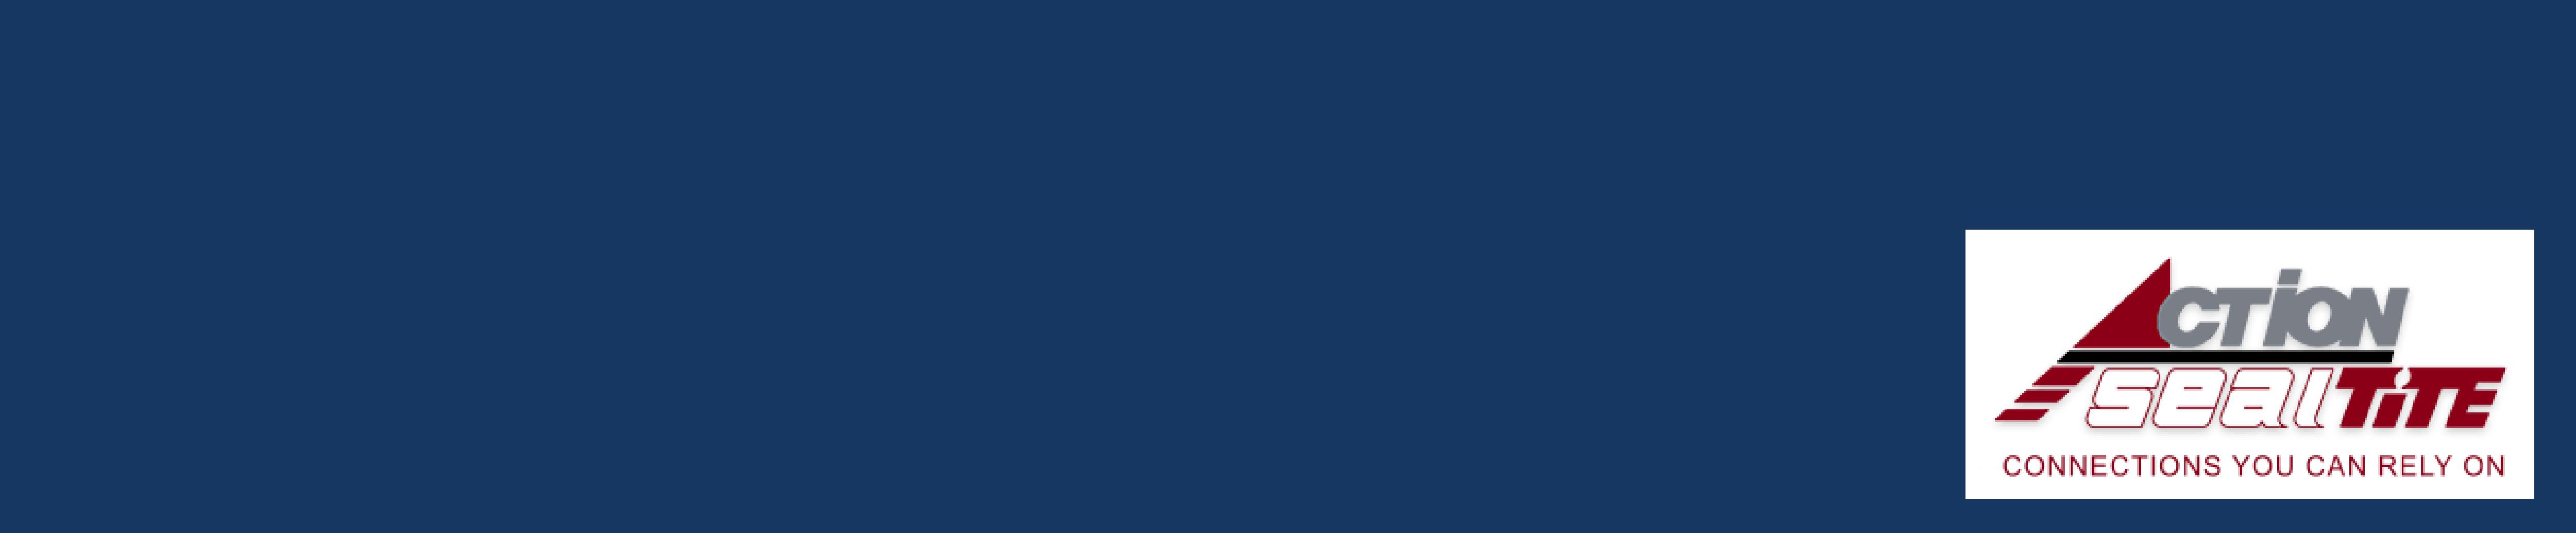 Action Sealtite page header logo banner_1